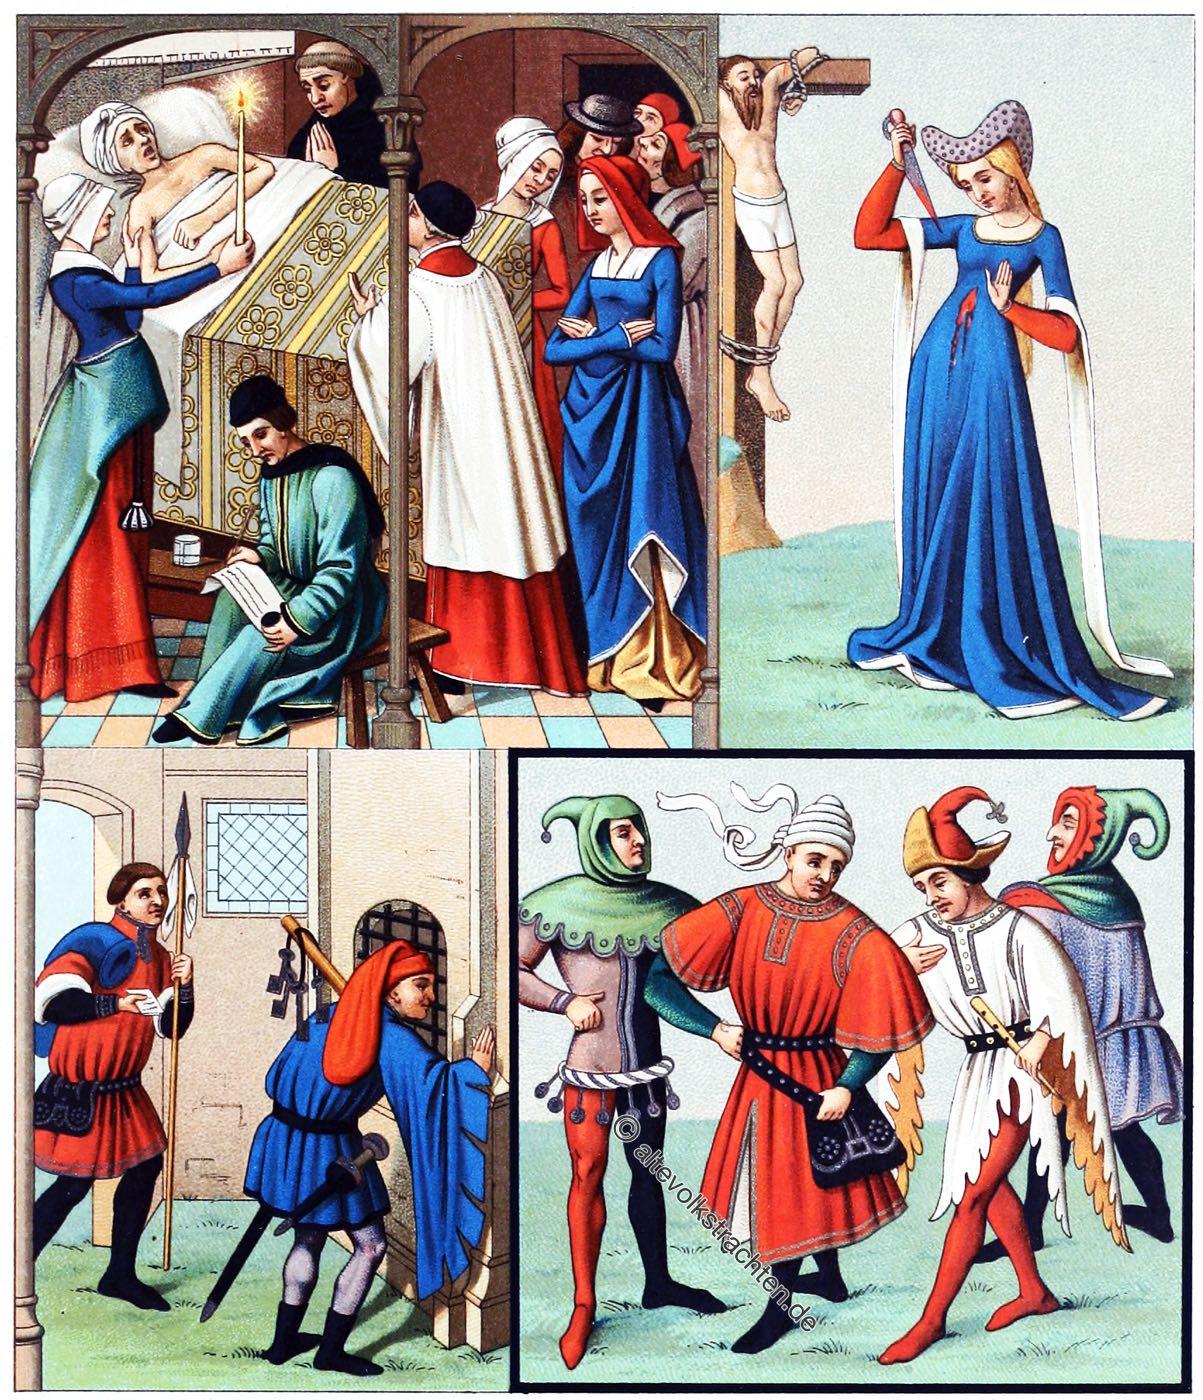 Mittelalter, Gewandung, Tabart, Hoike, 14. Jahrhundert, Mode, Kostüme, Mittelalter Gewandung, Schellentracht, Zatteltracht, Auguste Racinet